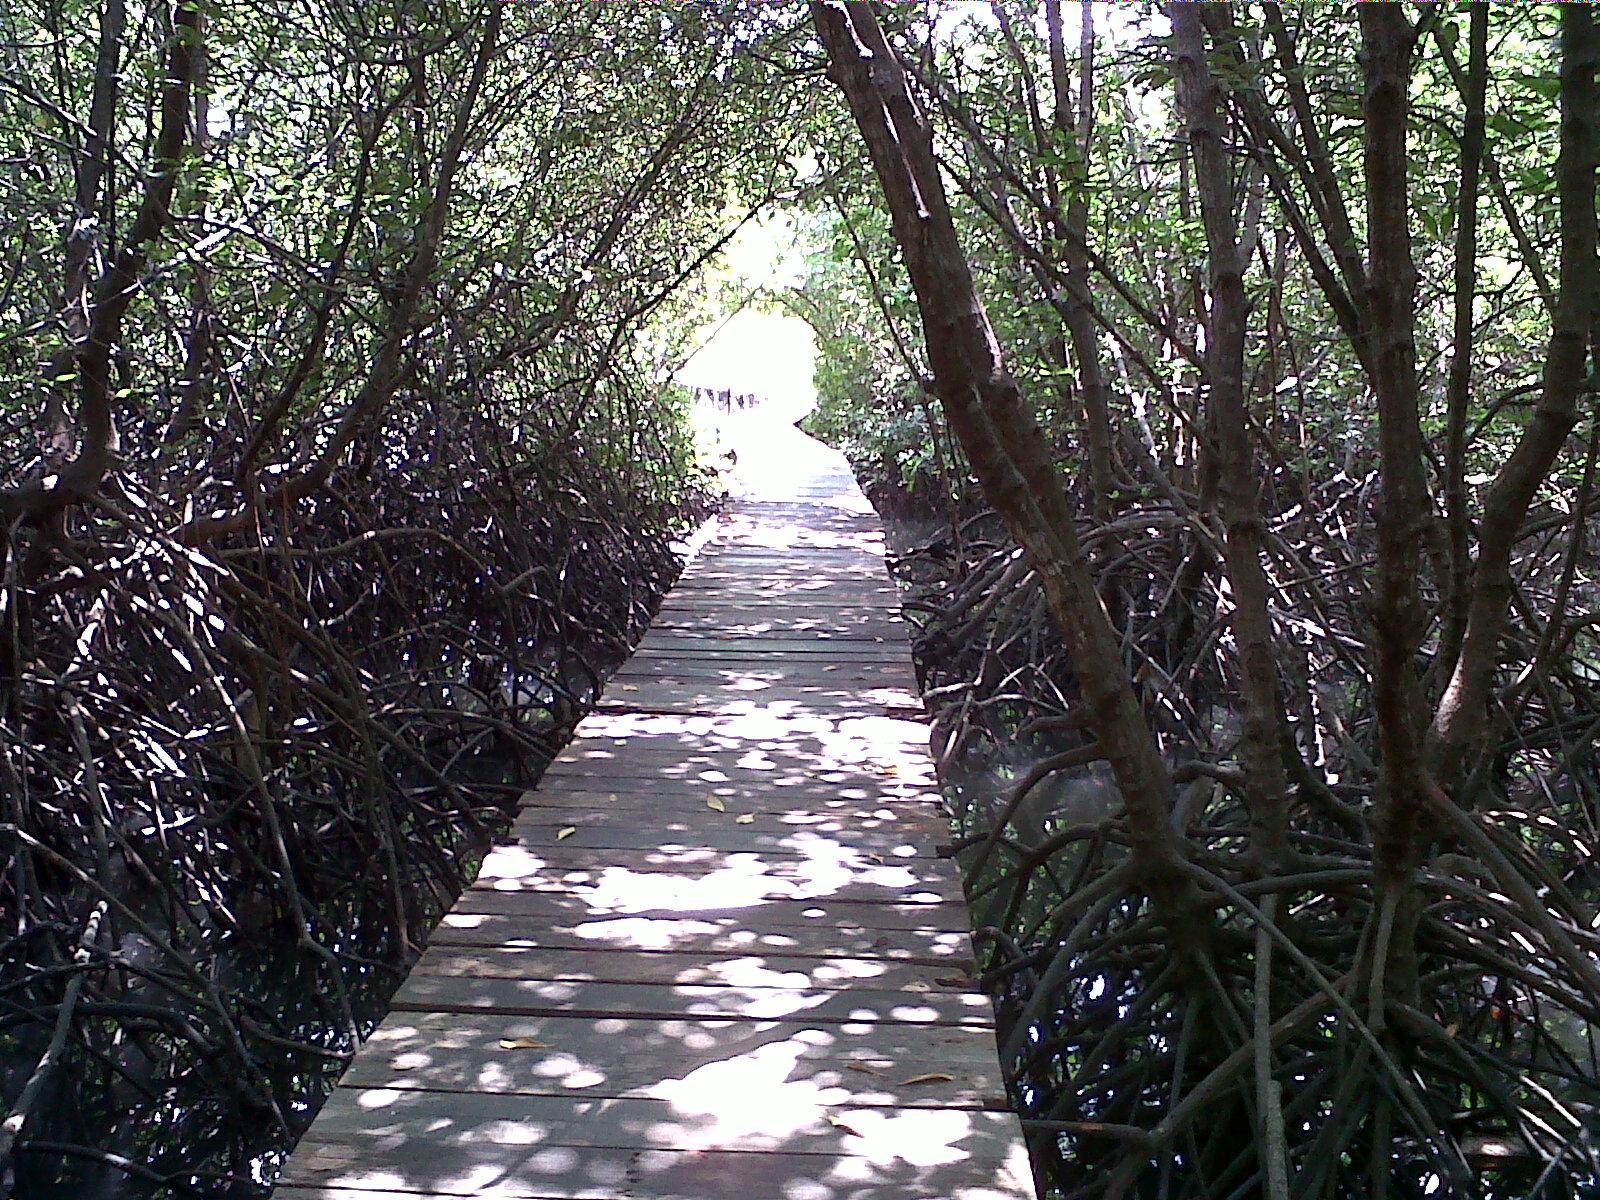 Tempat Wisata Hutan Mangrove Bali Pemandangan Bakau Kota Denpasar